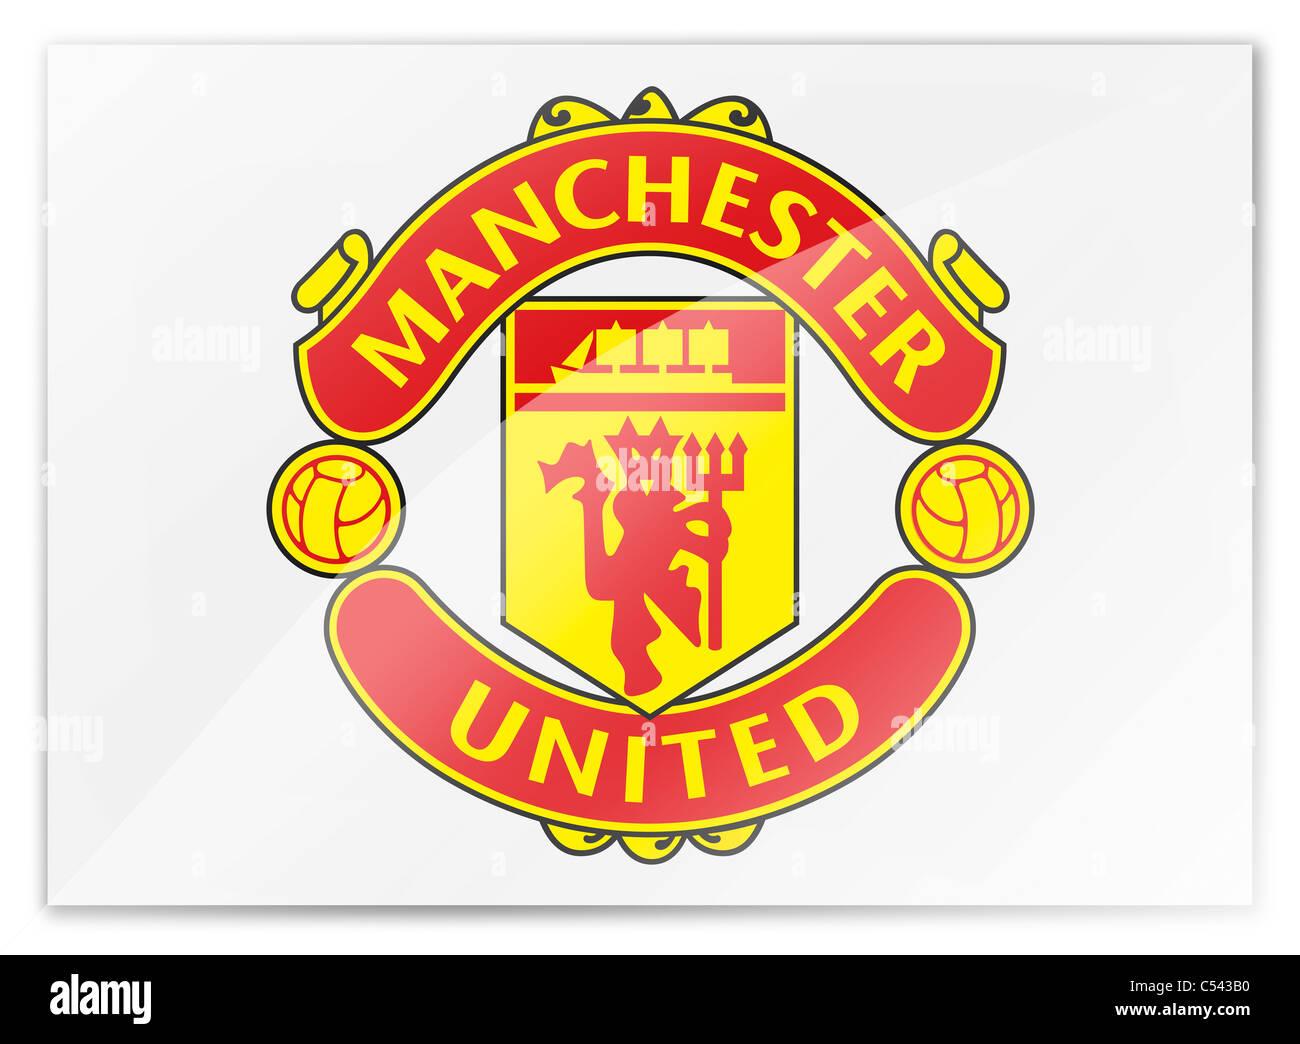 Manchester united flag logo symbol icon stock photo 37584484 alamy manchester united flag logo symbol icon voltagebd Images